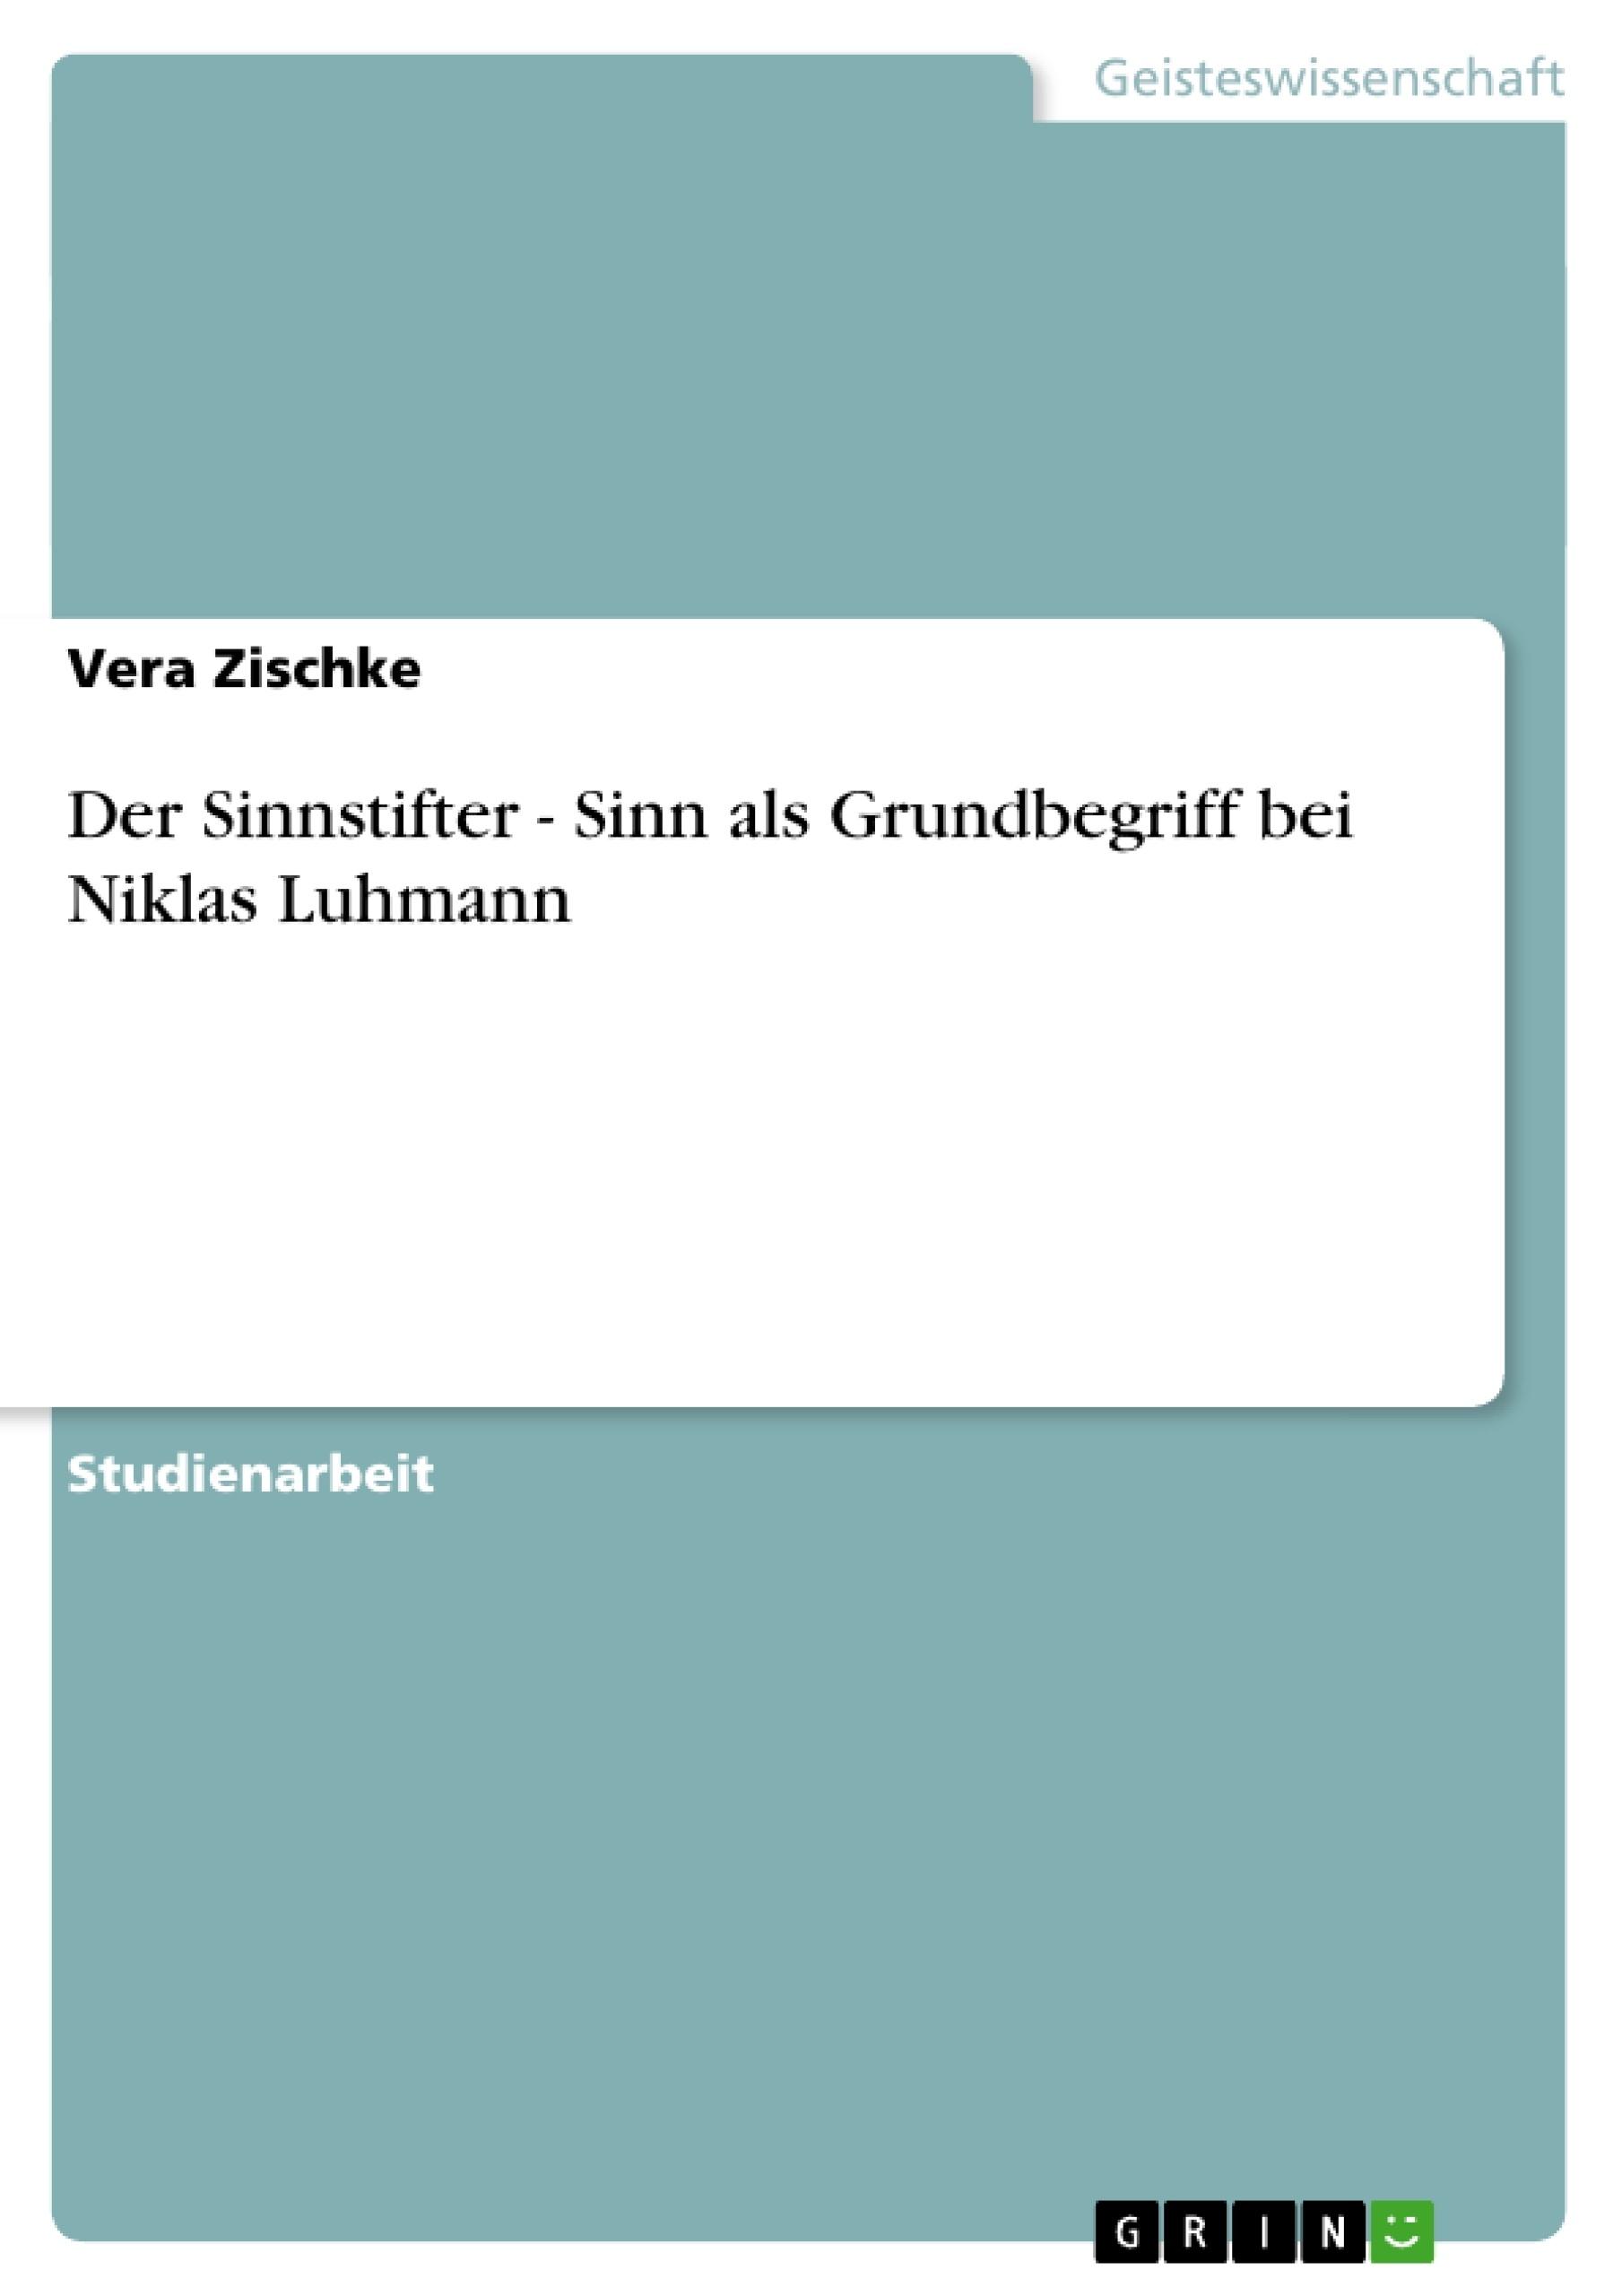 Titel: Der Sinnstifter - Sinn als Grundbegriff bei Niklas Luhmann